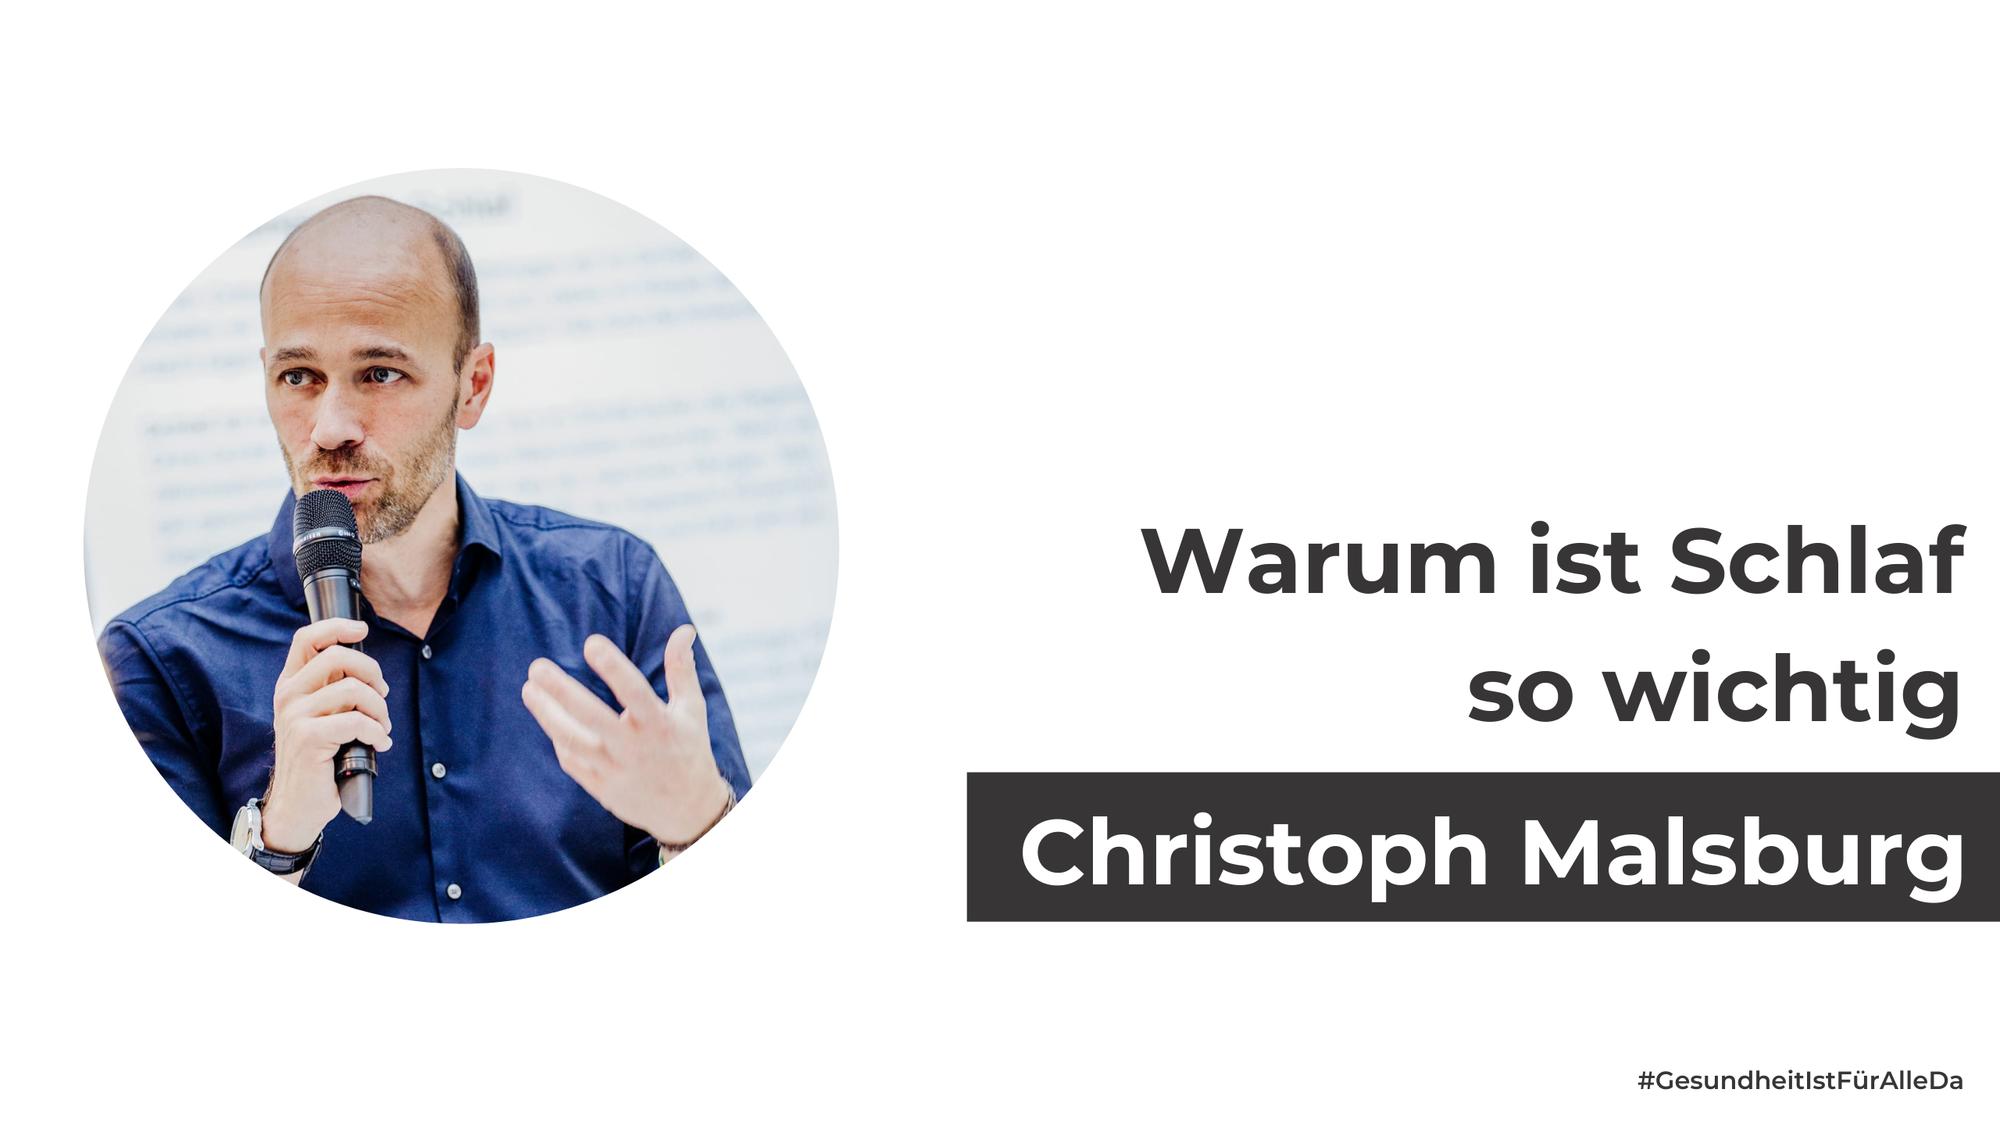 Christoph Malsburg